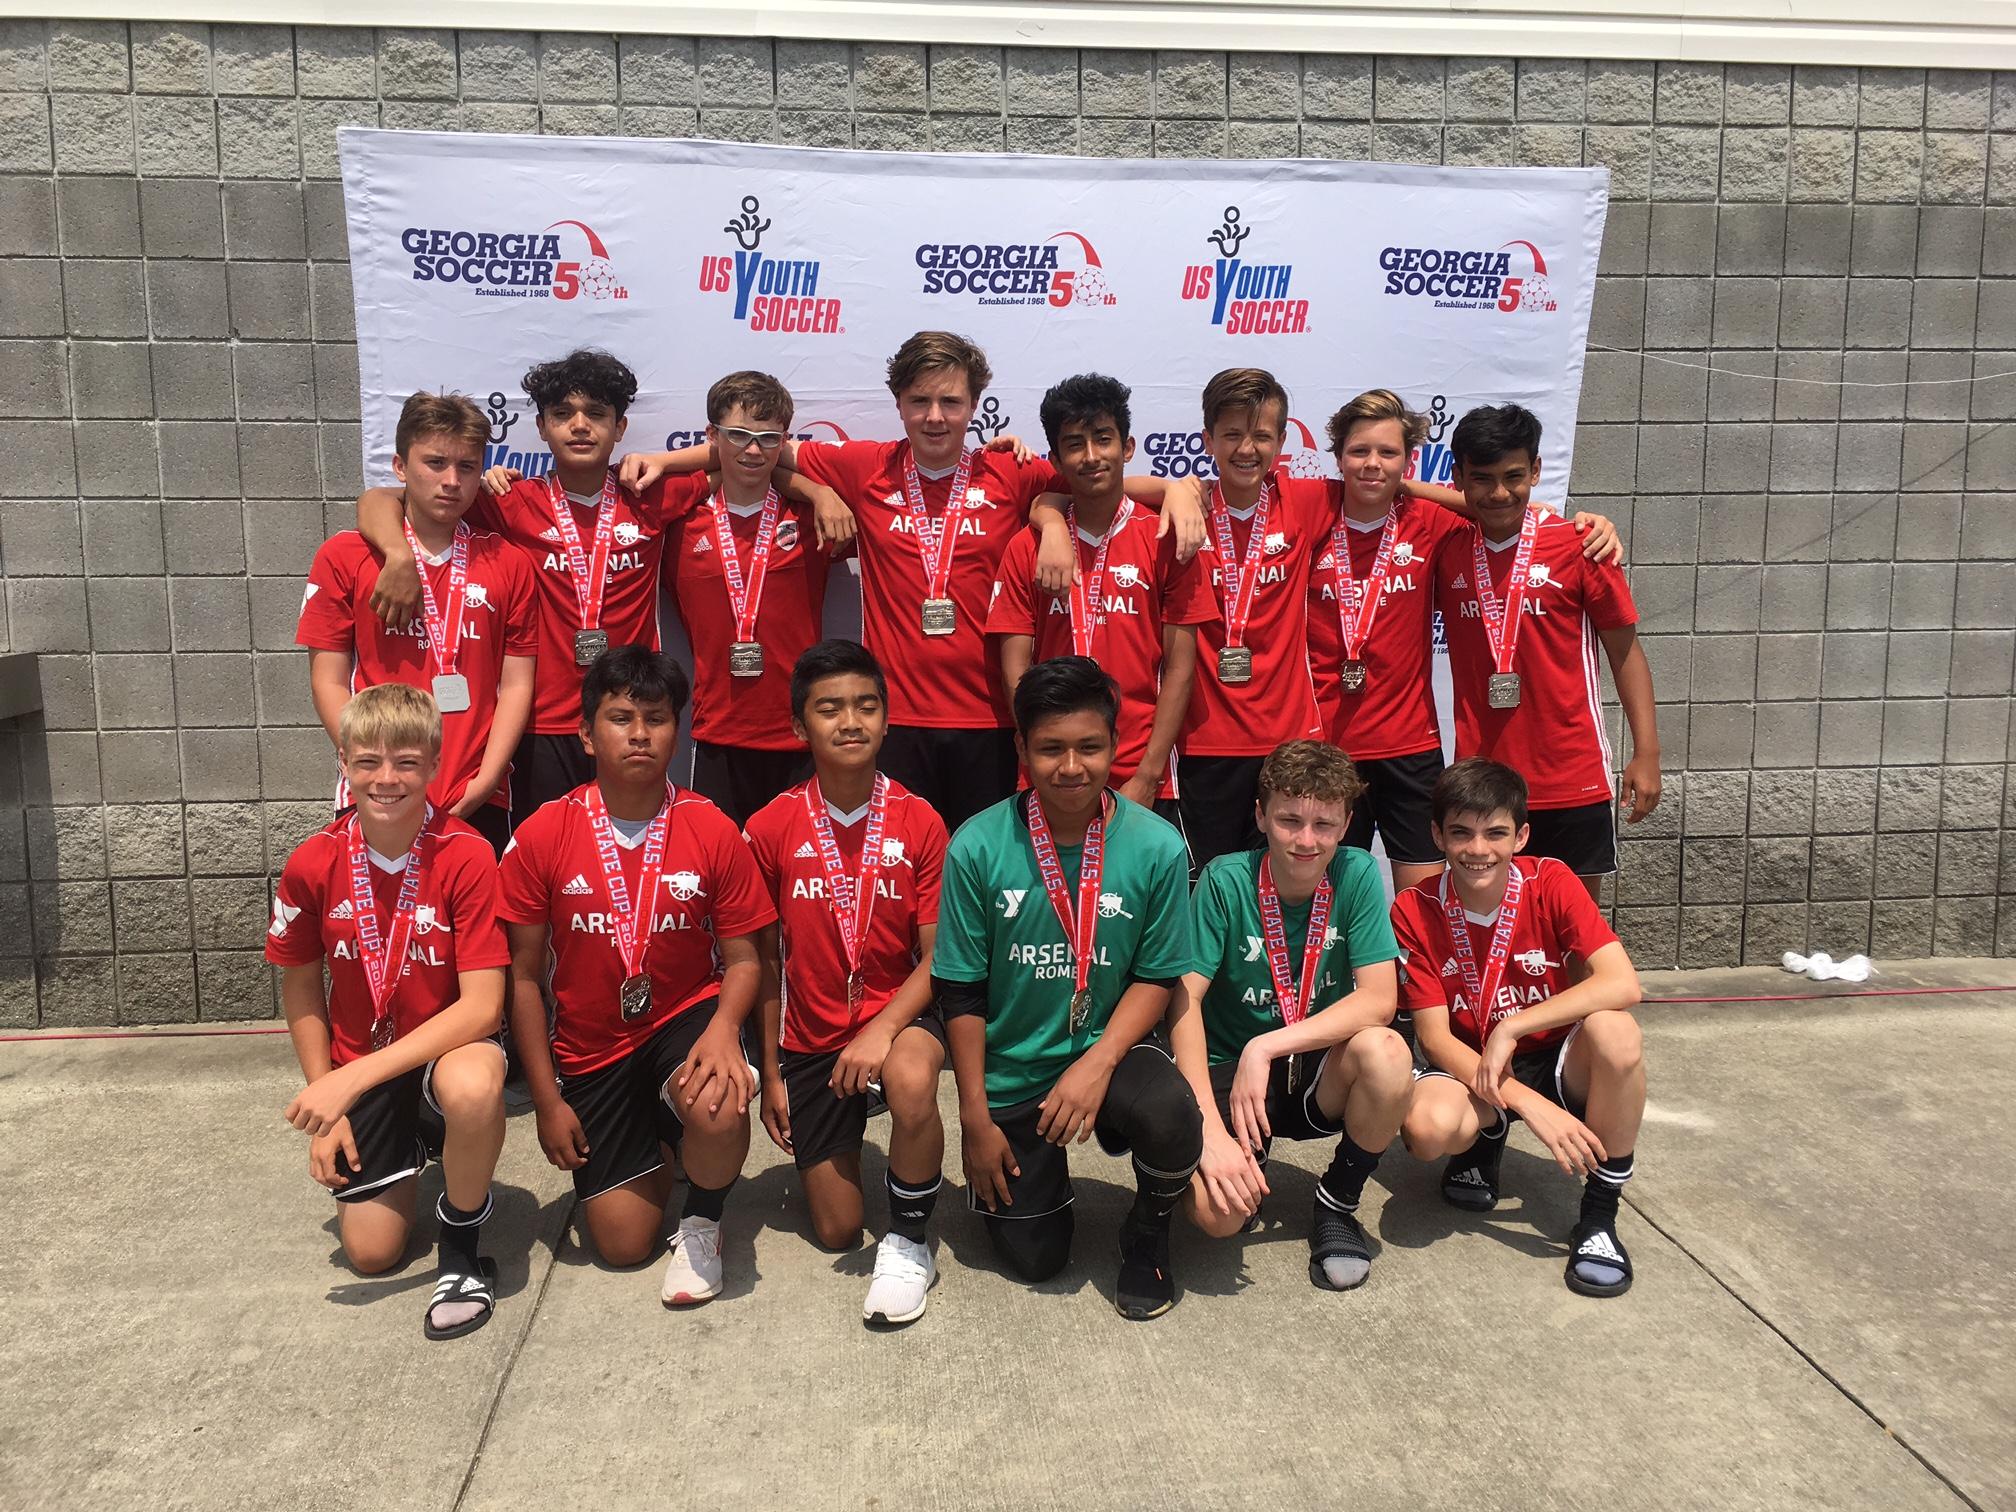 Team Details Us Youth Soccer